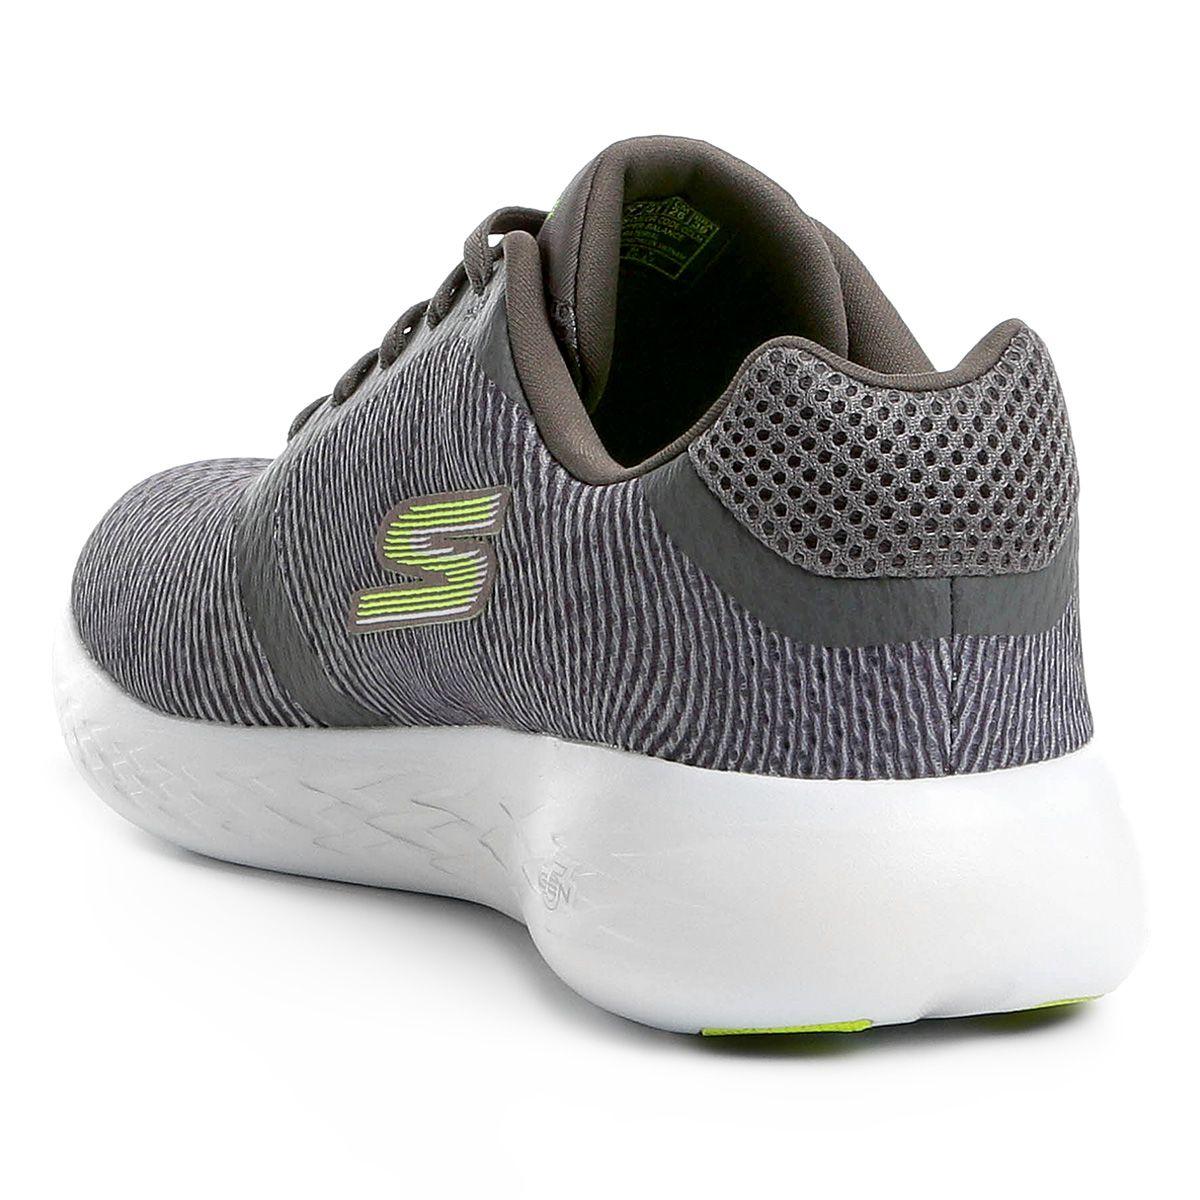 1d97ffa47 Tênis Skechers Go Run 600 Control Masculino - Cinza e Verde - Titanes  Esportes